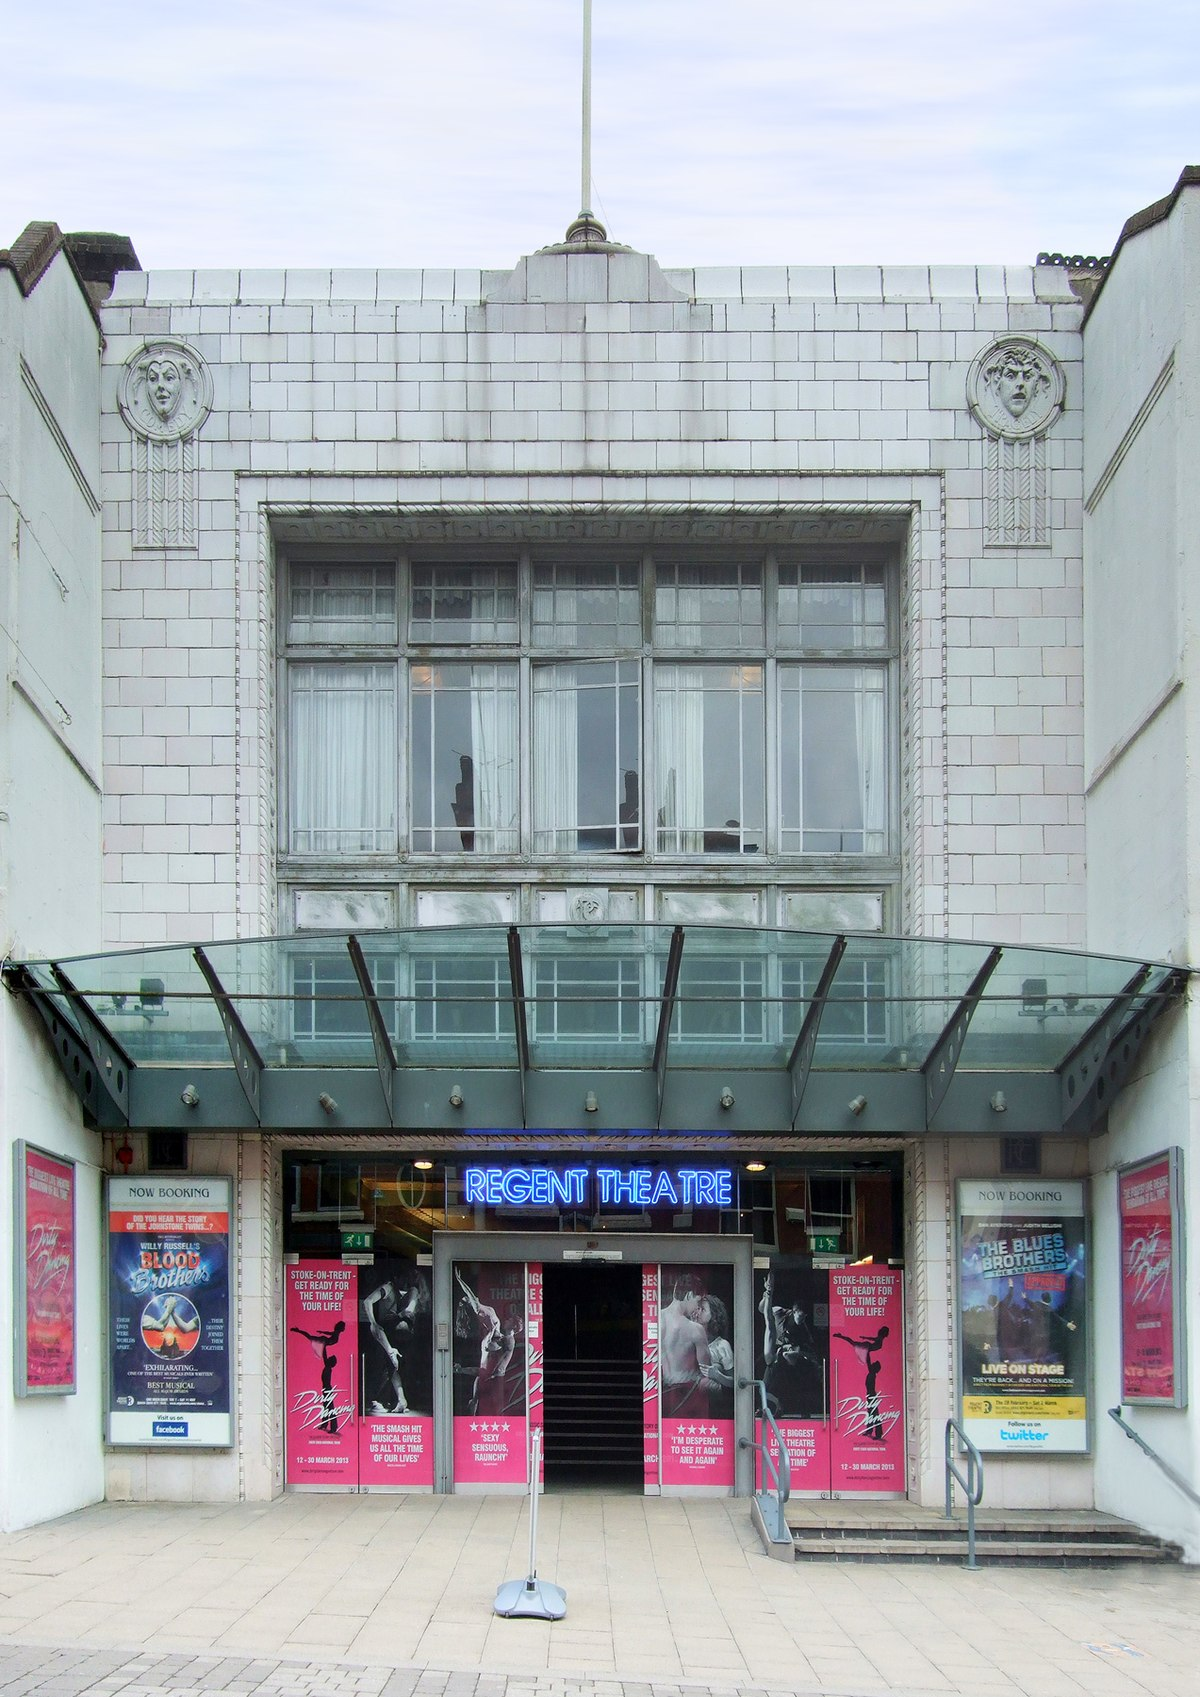 Regent Theatre, Stoke-on-Trent - Wikipedia